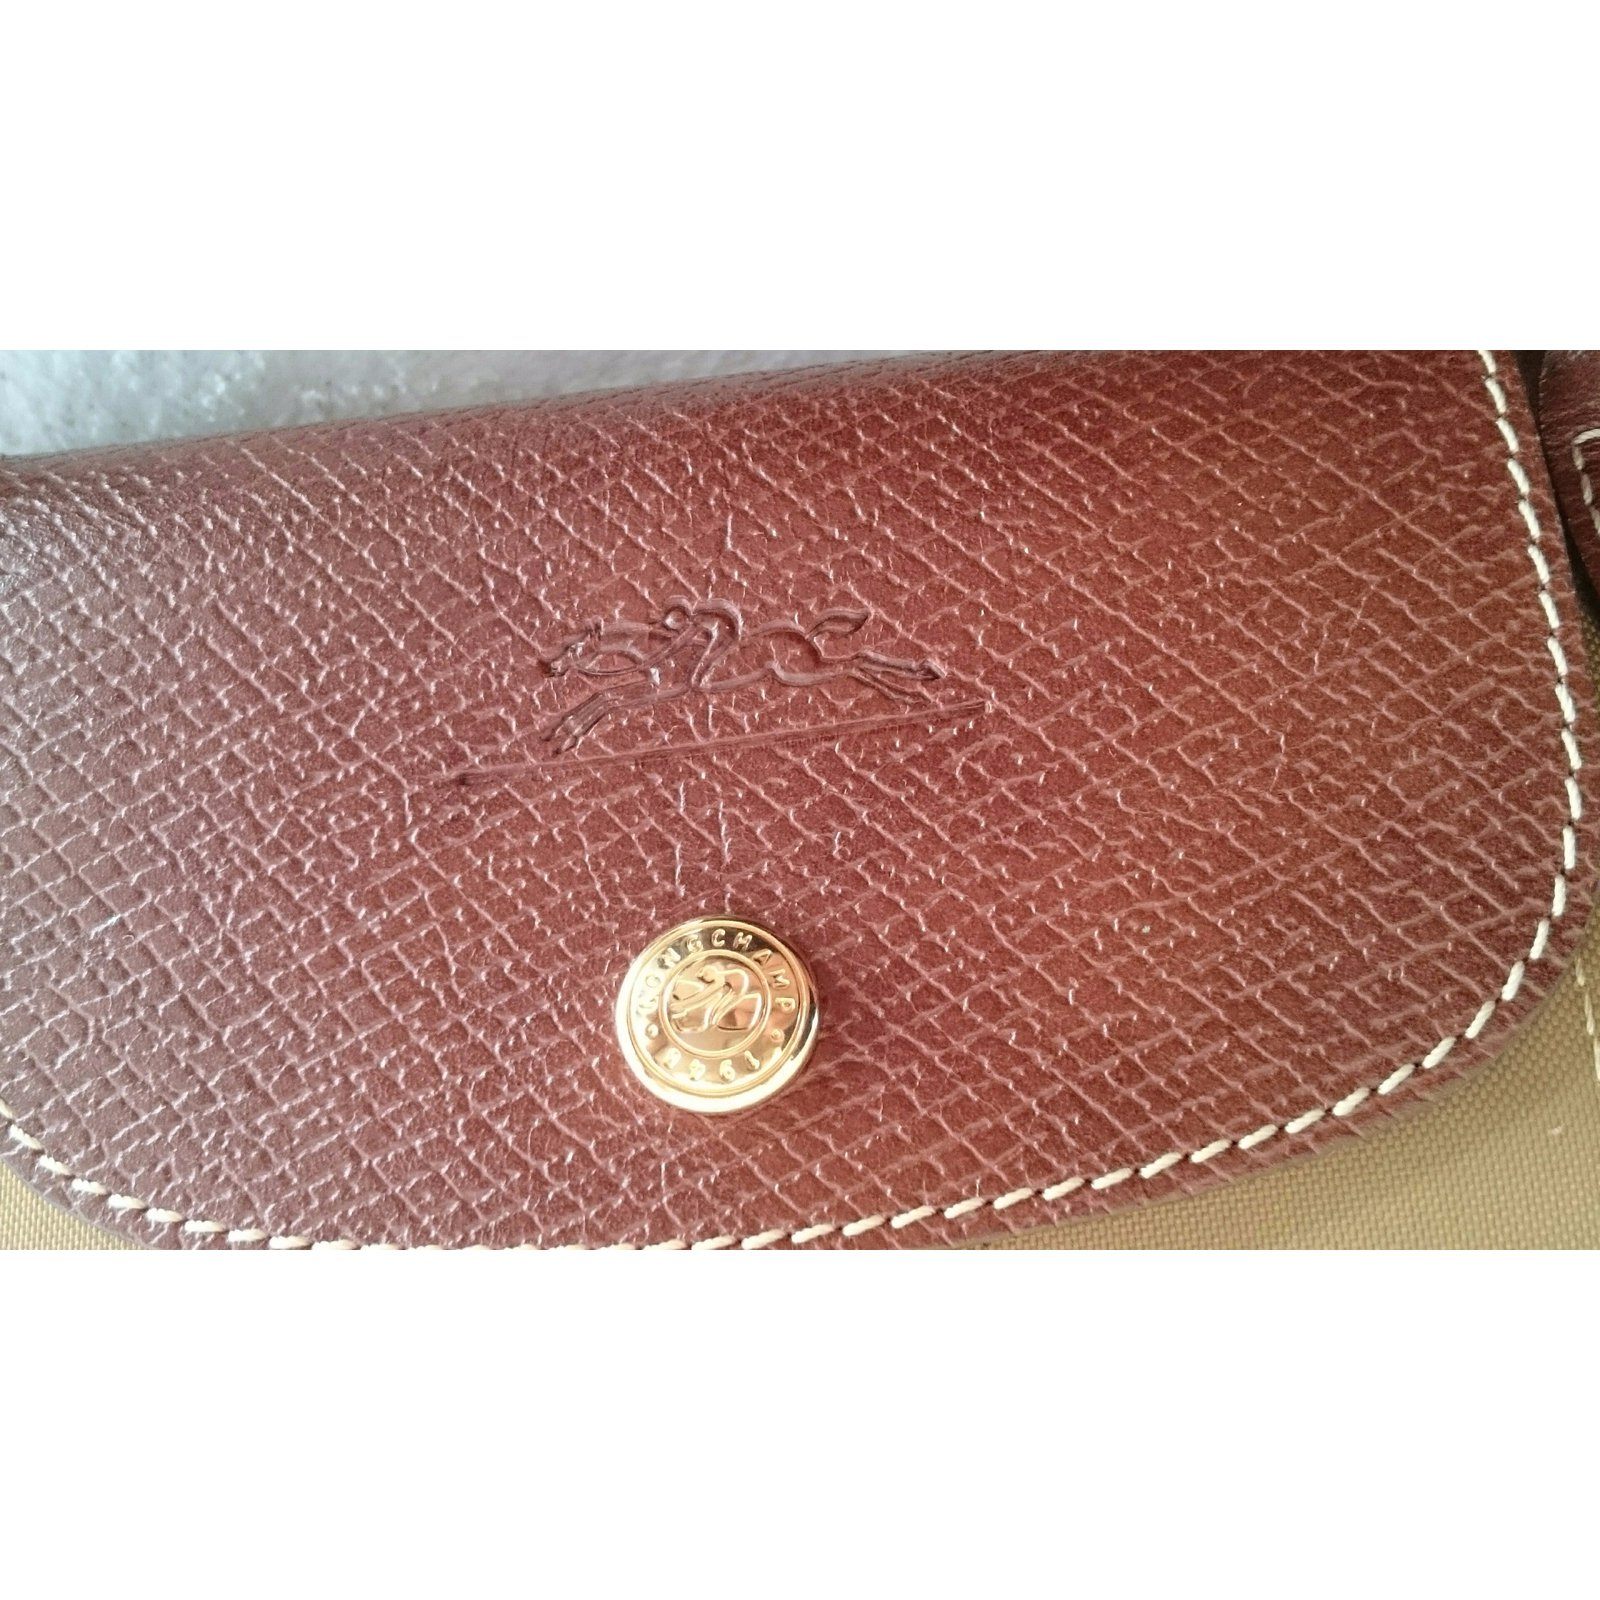 e60cf1579c79 Facebook · Pin This. Longchamp Handbags Handbags Leather ...